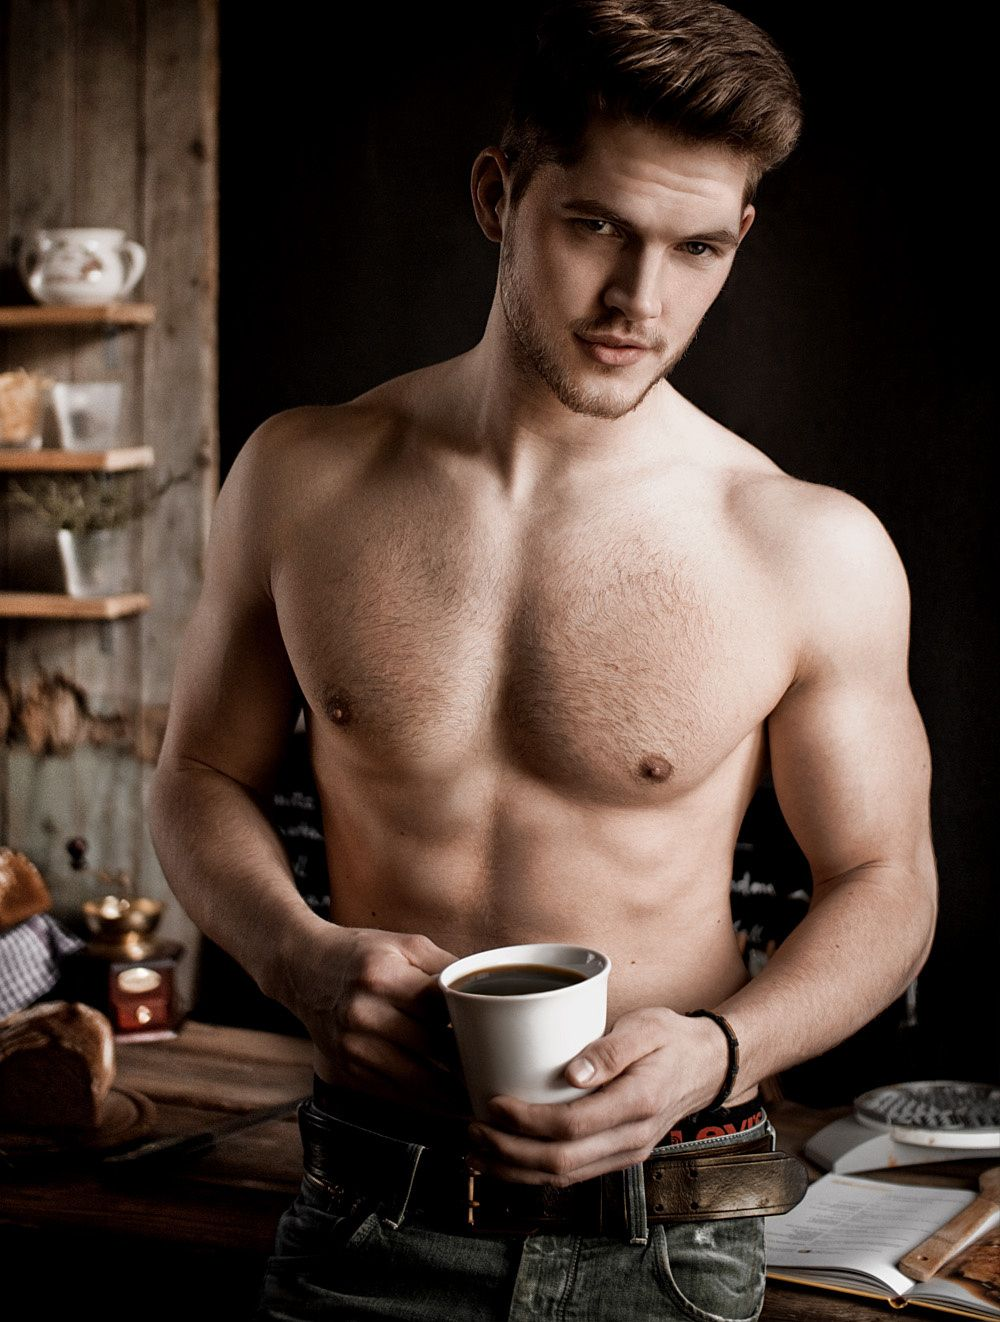 комфортное мужчина варит кофе картинки содержит хлор безопасен